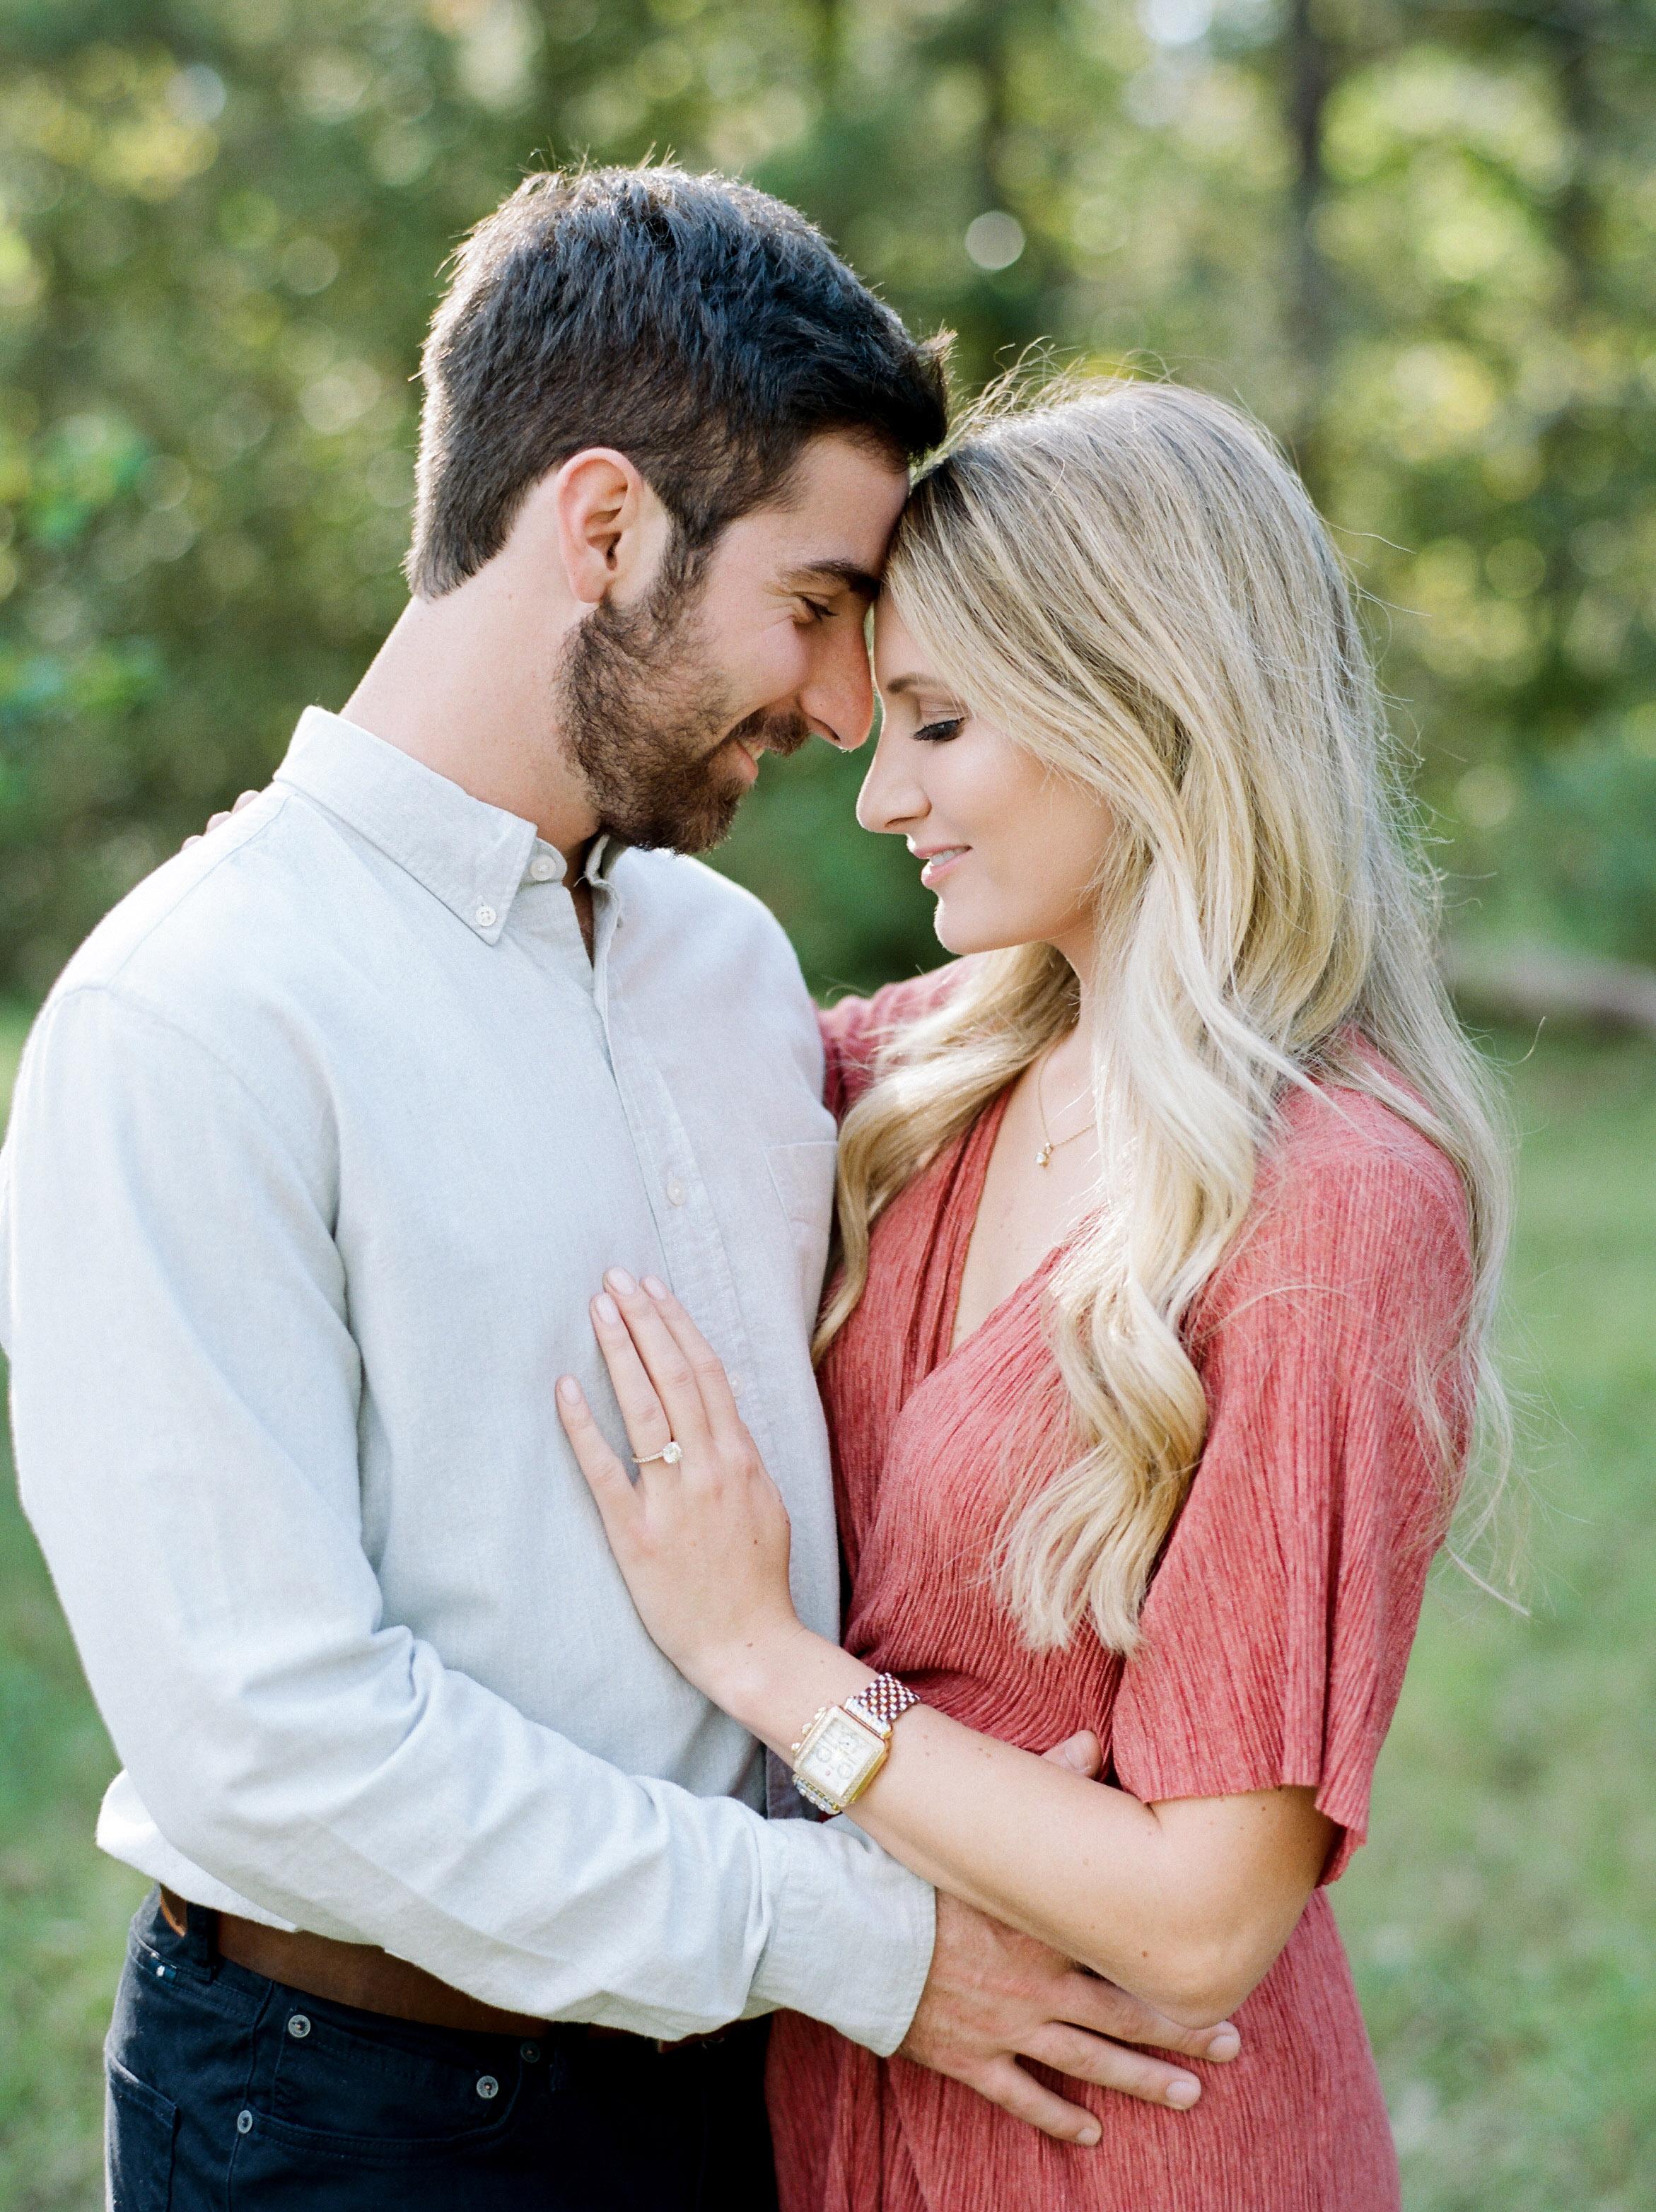 Houston-Wedding-Photographer-Best-Top-Luxury-Destination-Engagements-Portrait-Austin-Photography-3.jpg